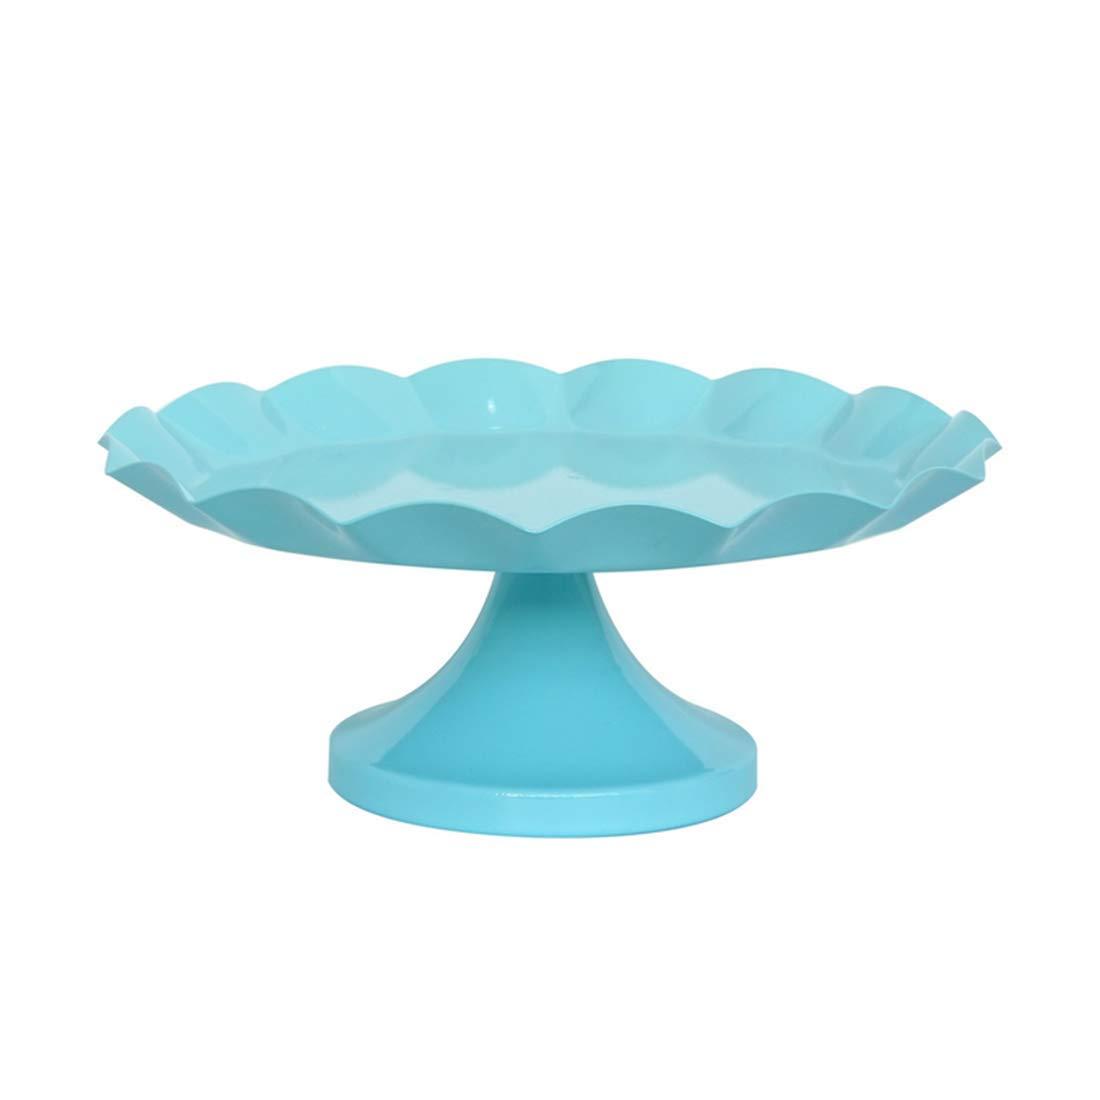 RABILTY ケーキスタンド カップケーキ デザートディスプレイスタンド パーティー ウェディング 誕生日 ブルー M RABILTY Medium  B07JQLZD6C